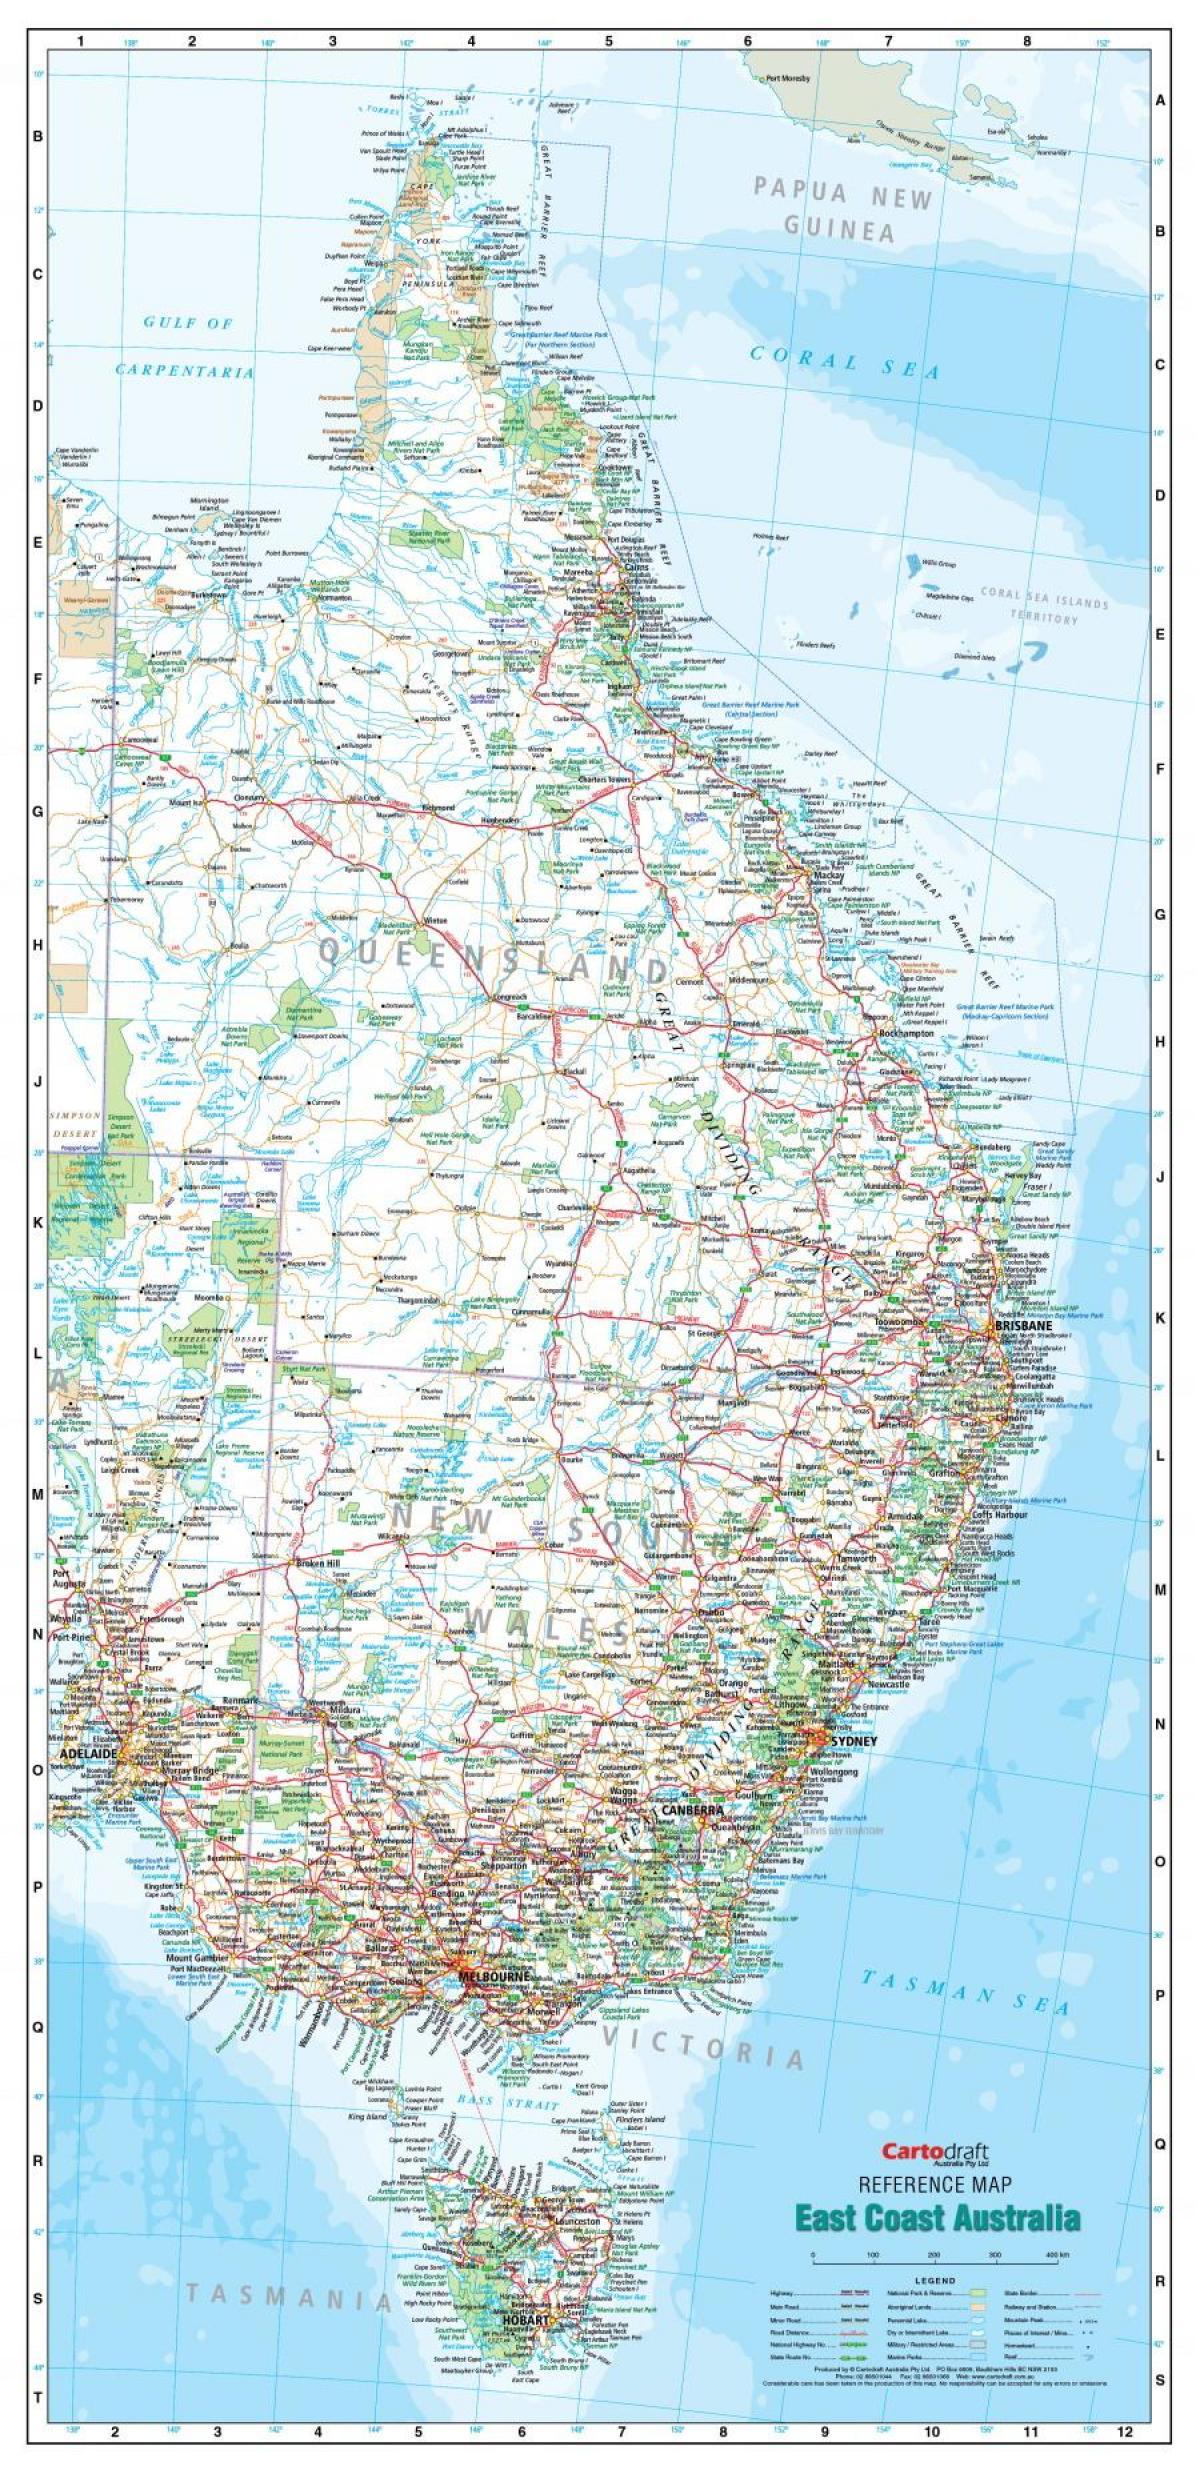 mapa da costa leste da austrlia